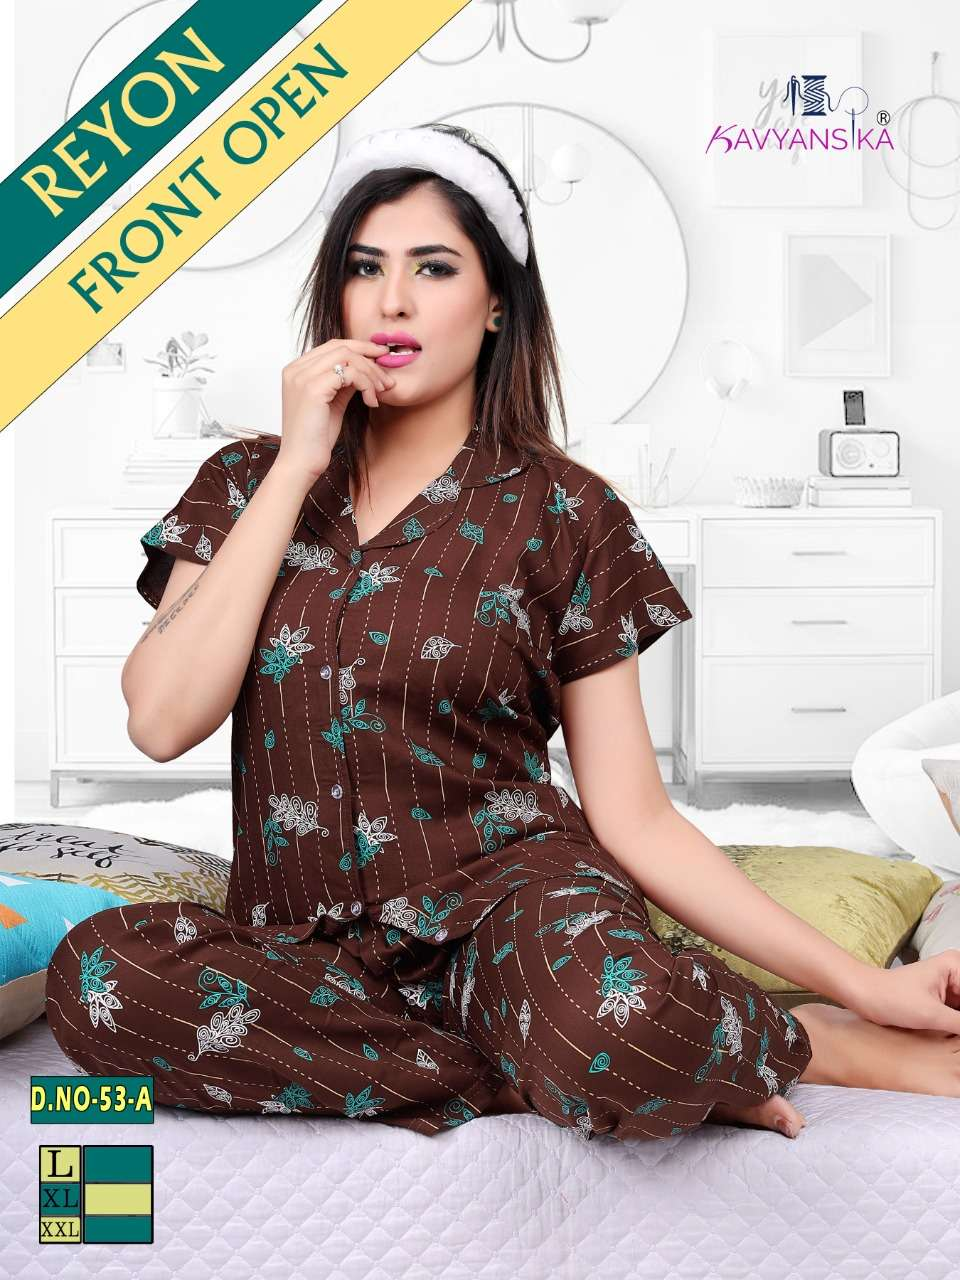 kavyansika collar night suit vol 53 rayon shirt night suit for women